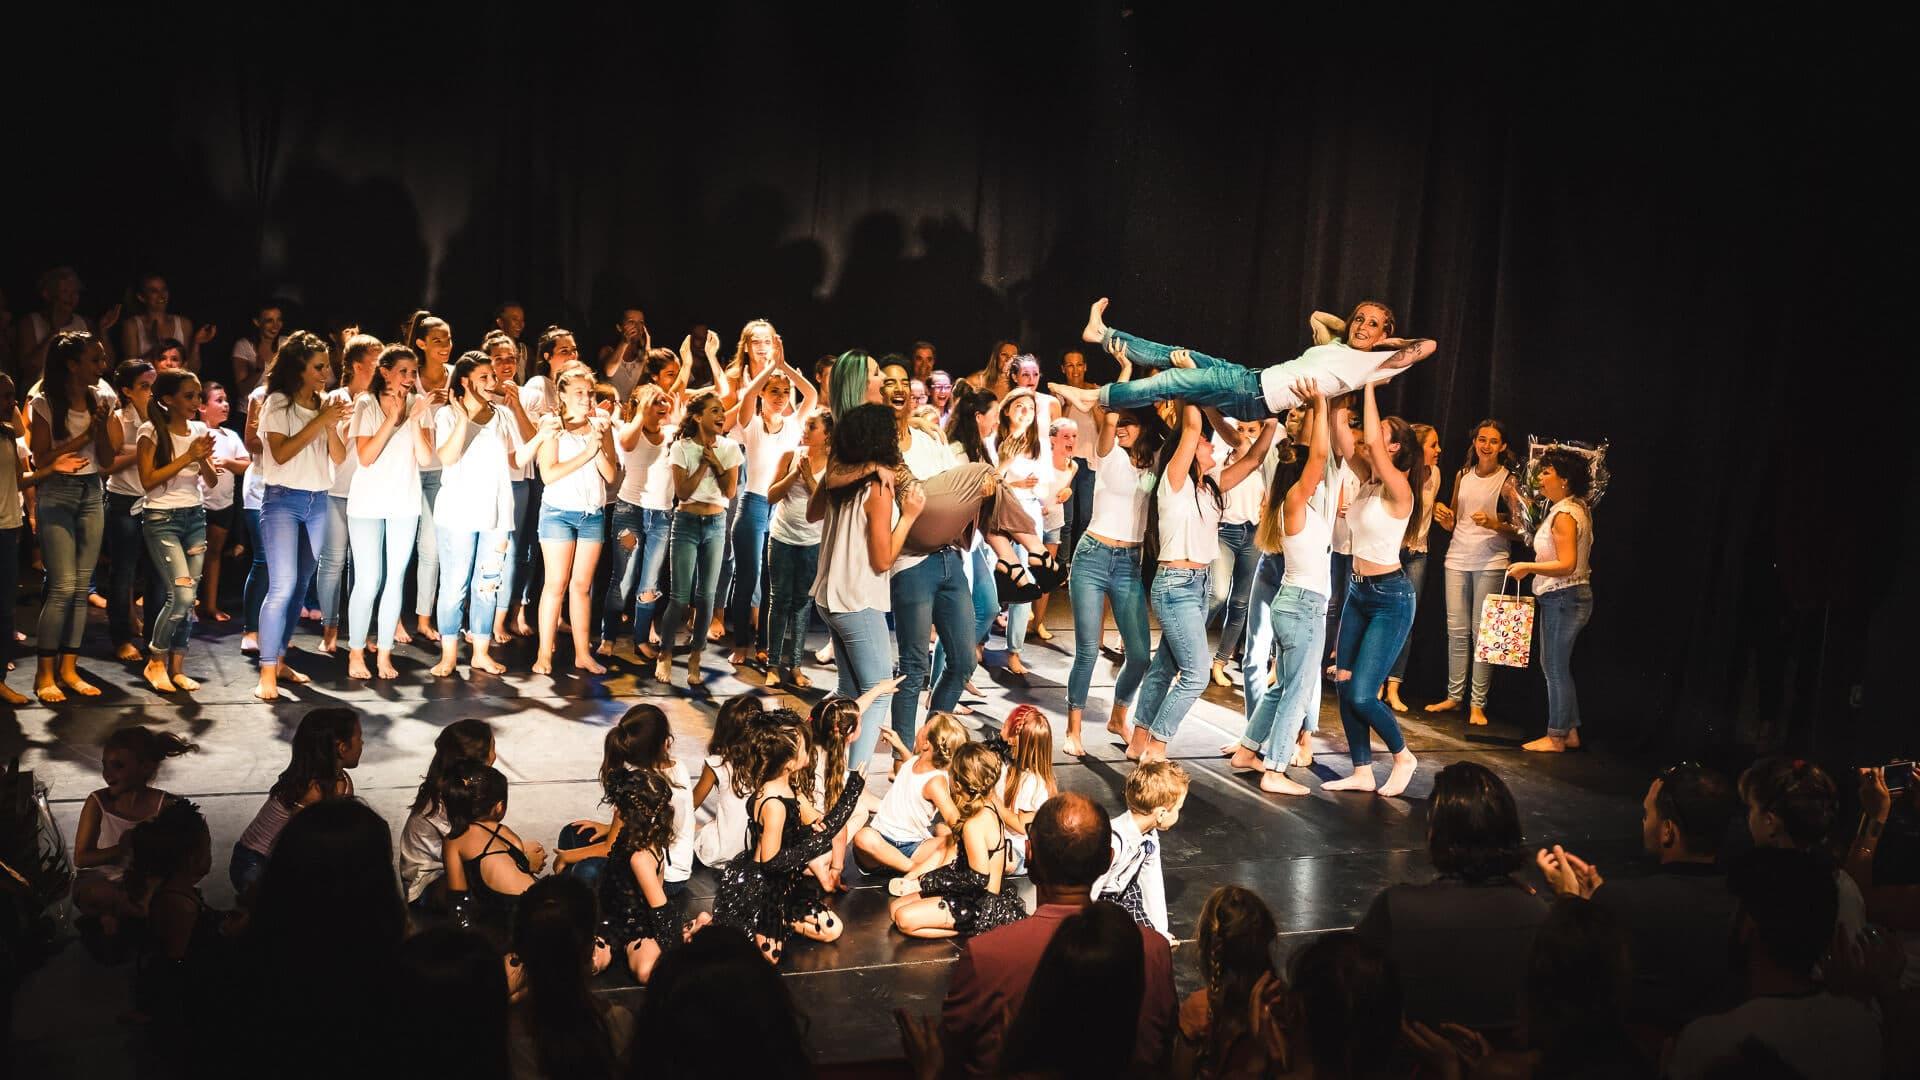 spectacle danse pezenas studio graou photographe